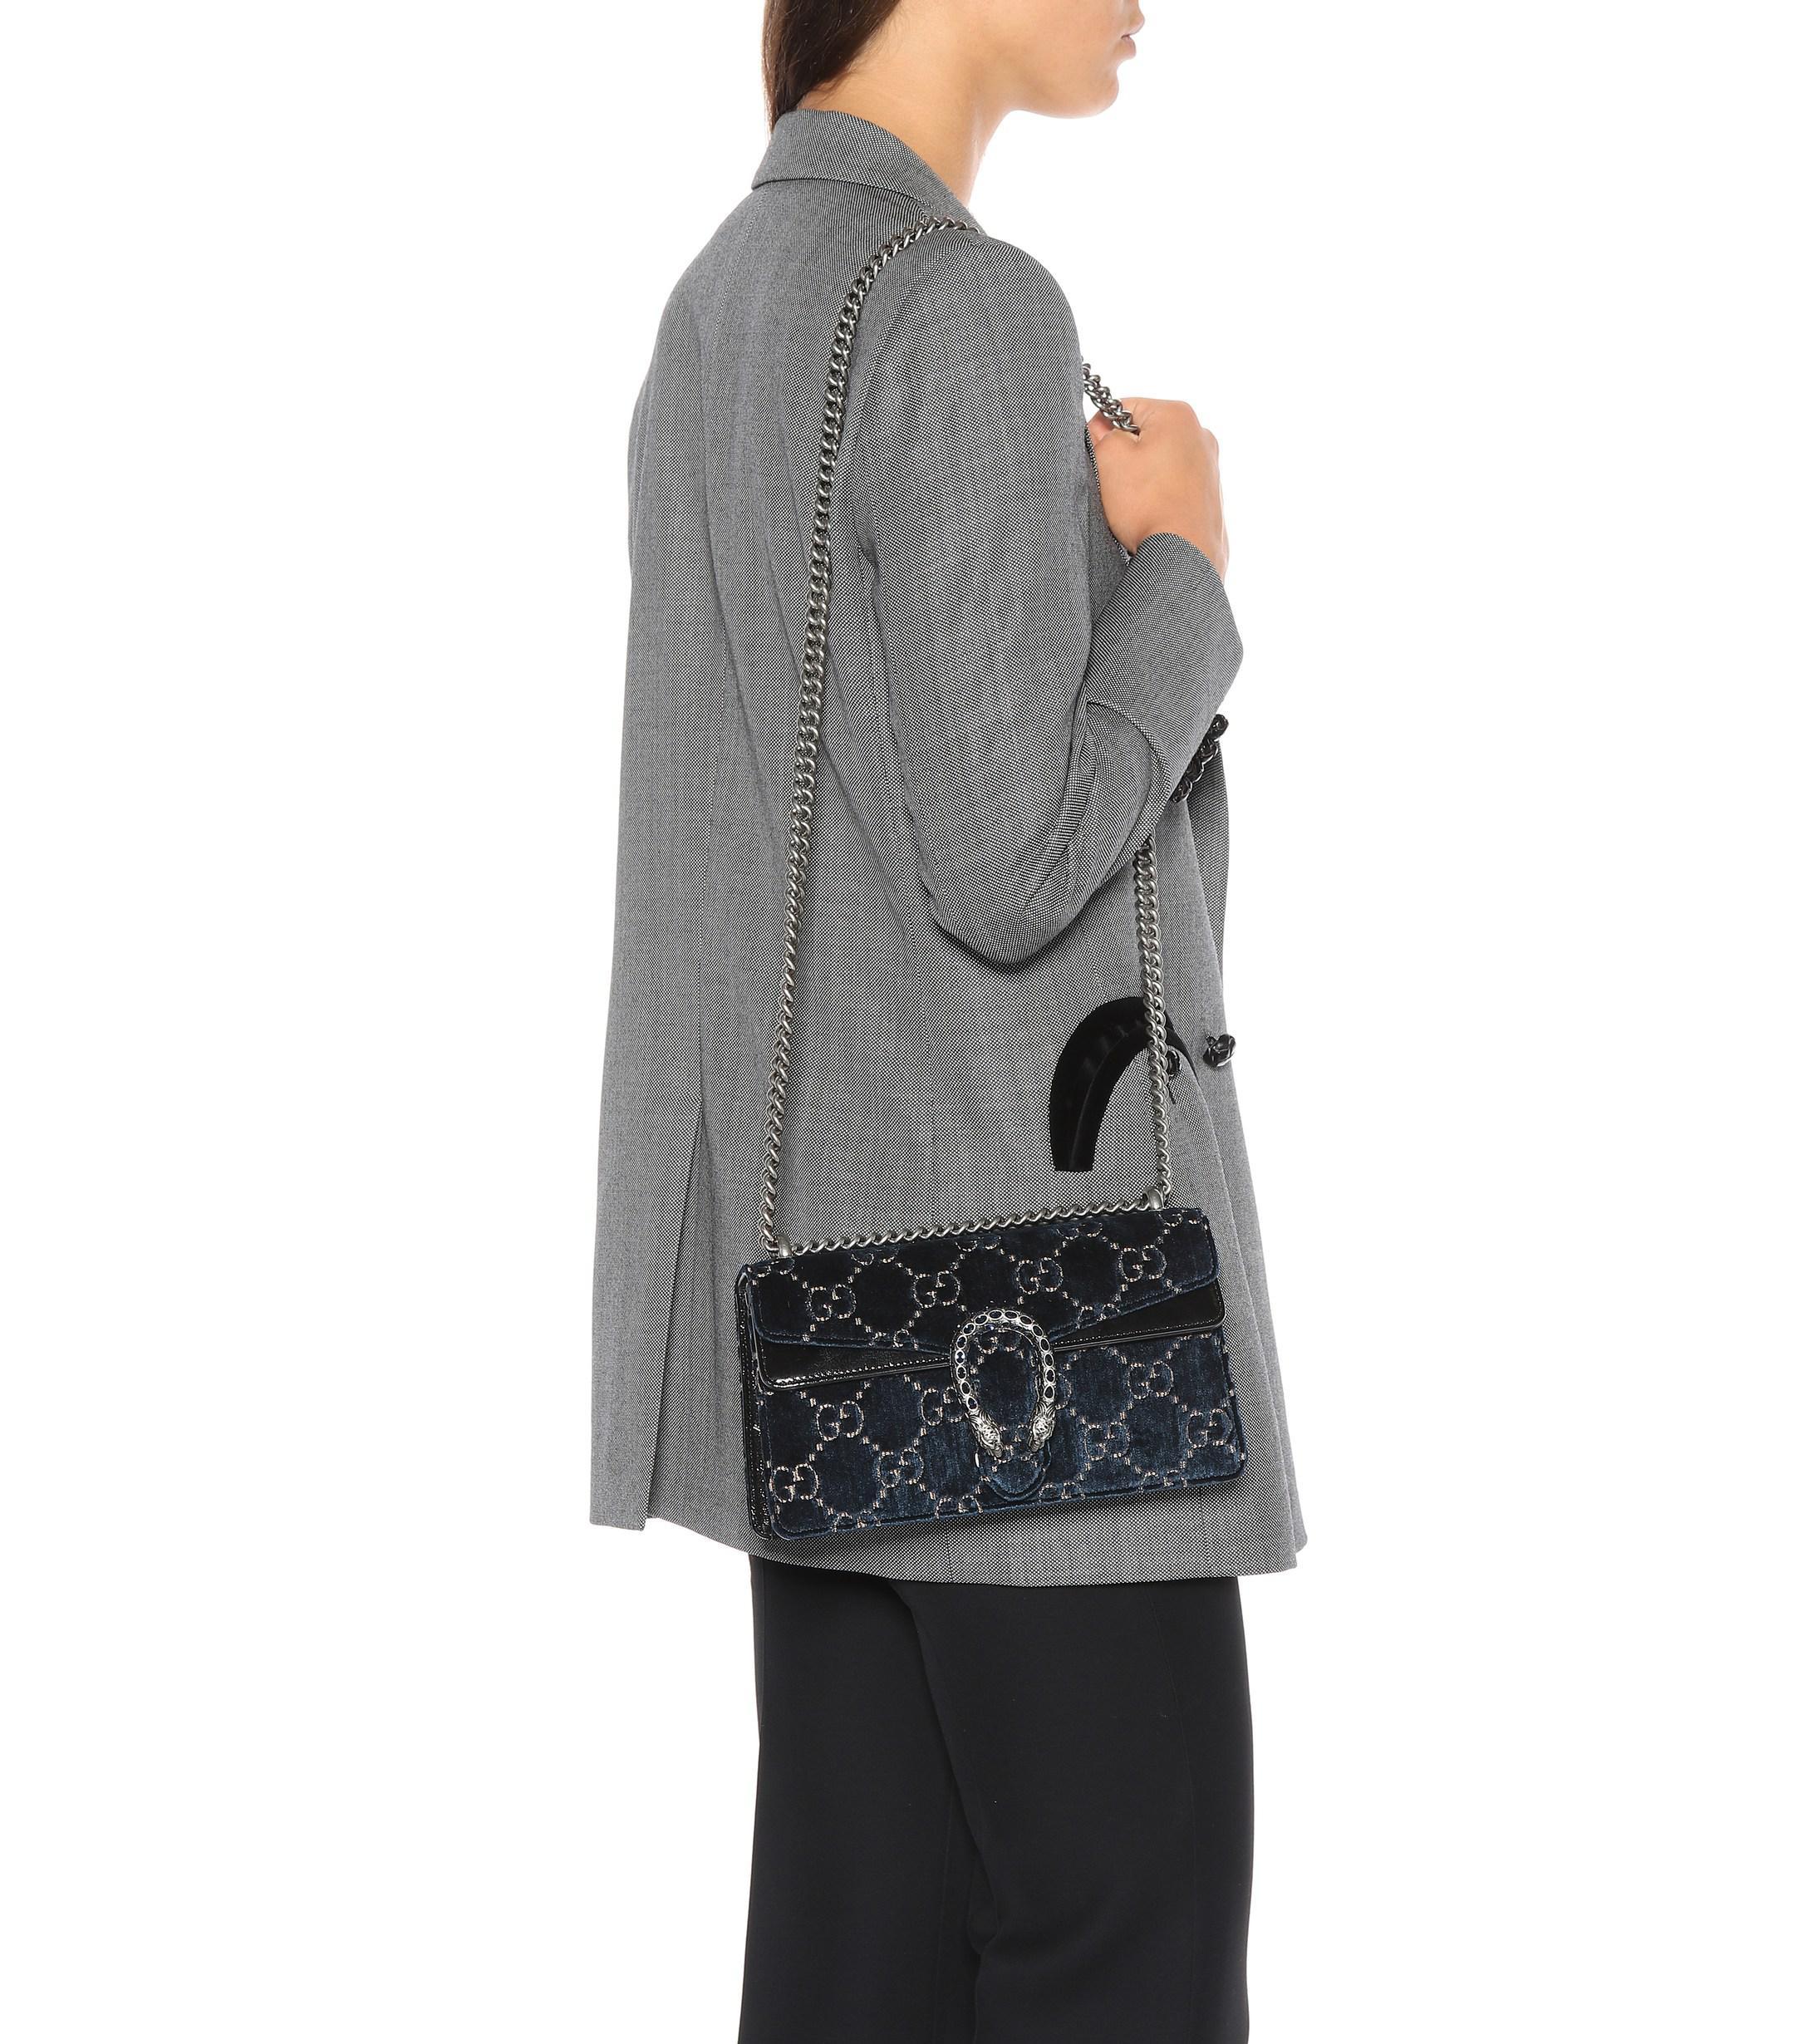 c60e2ba8e5d1 Gucci Dionysus GG Small Velvet Shoulder Bag in Blue - Lyst